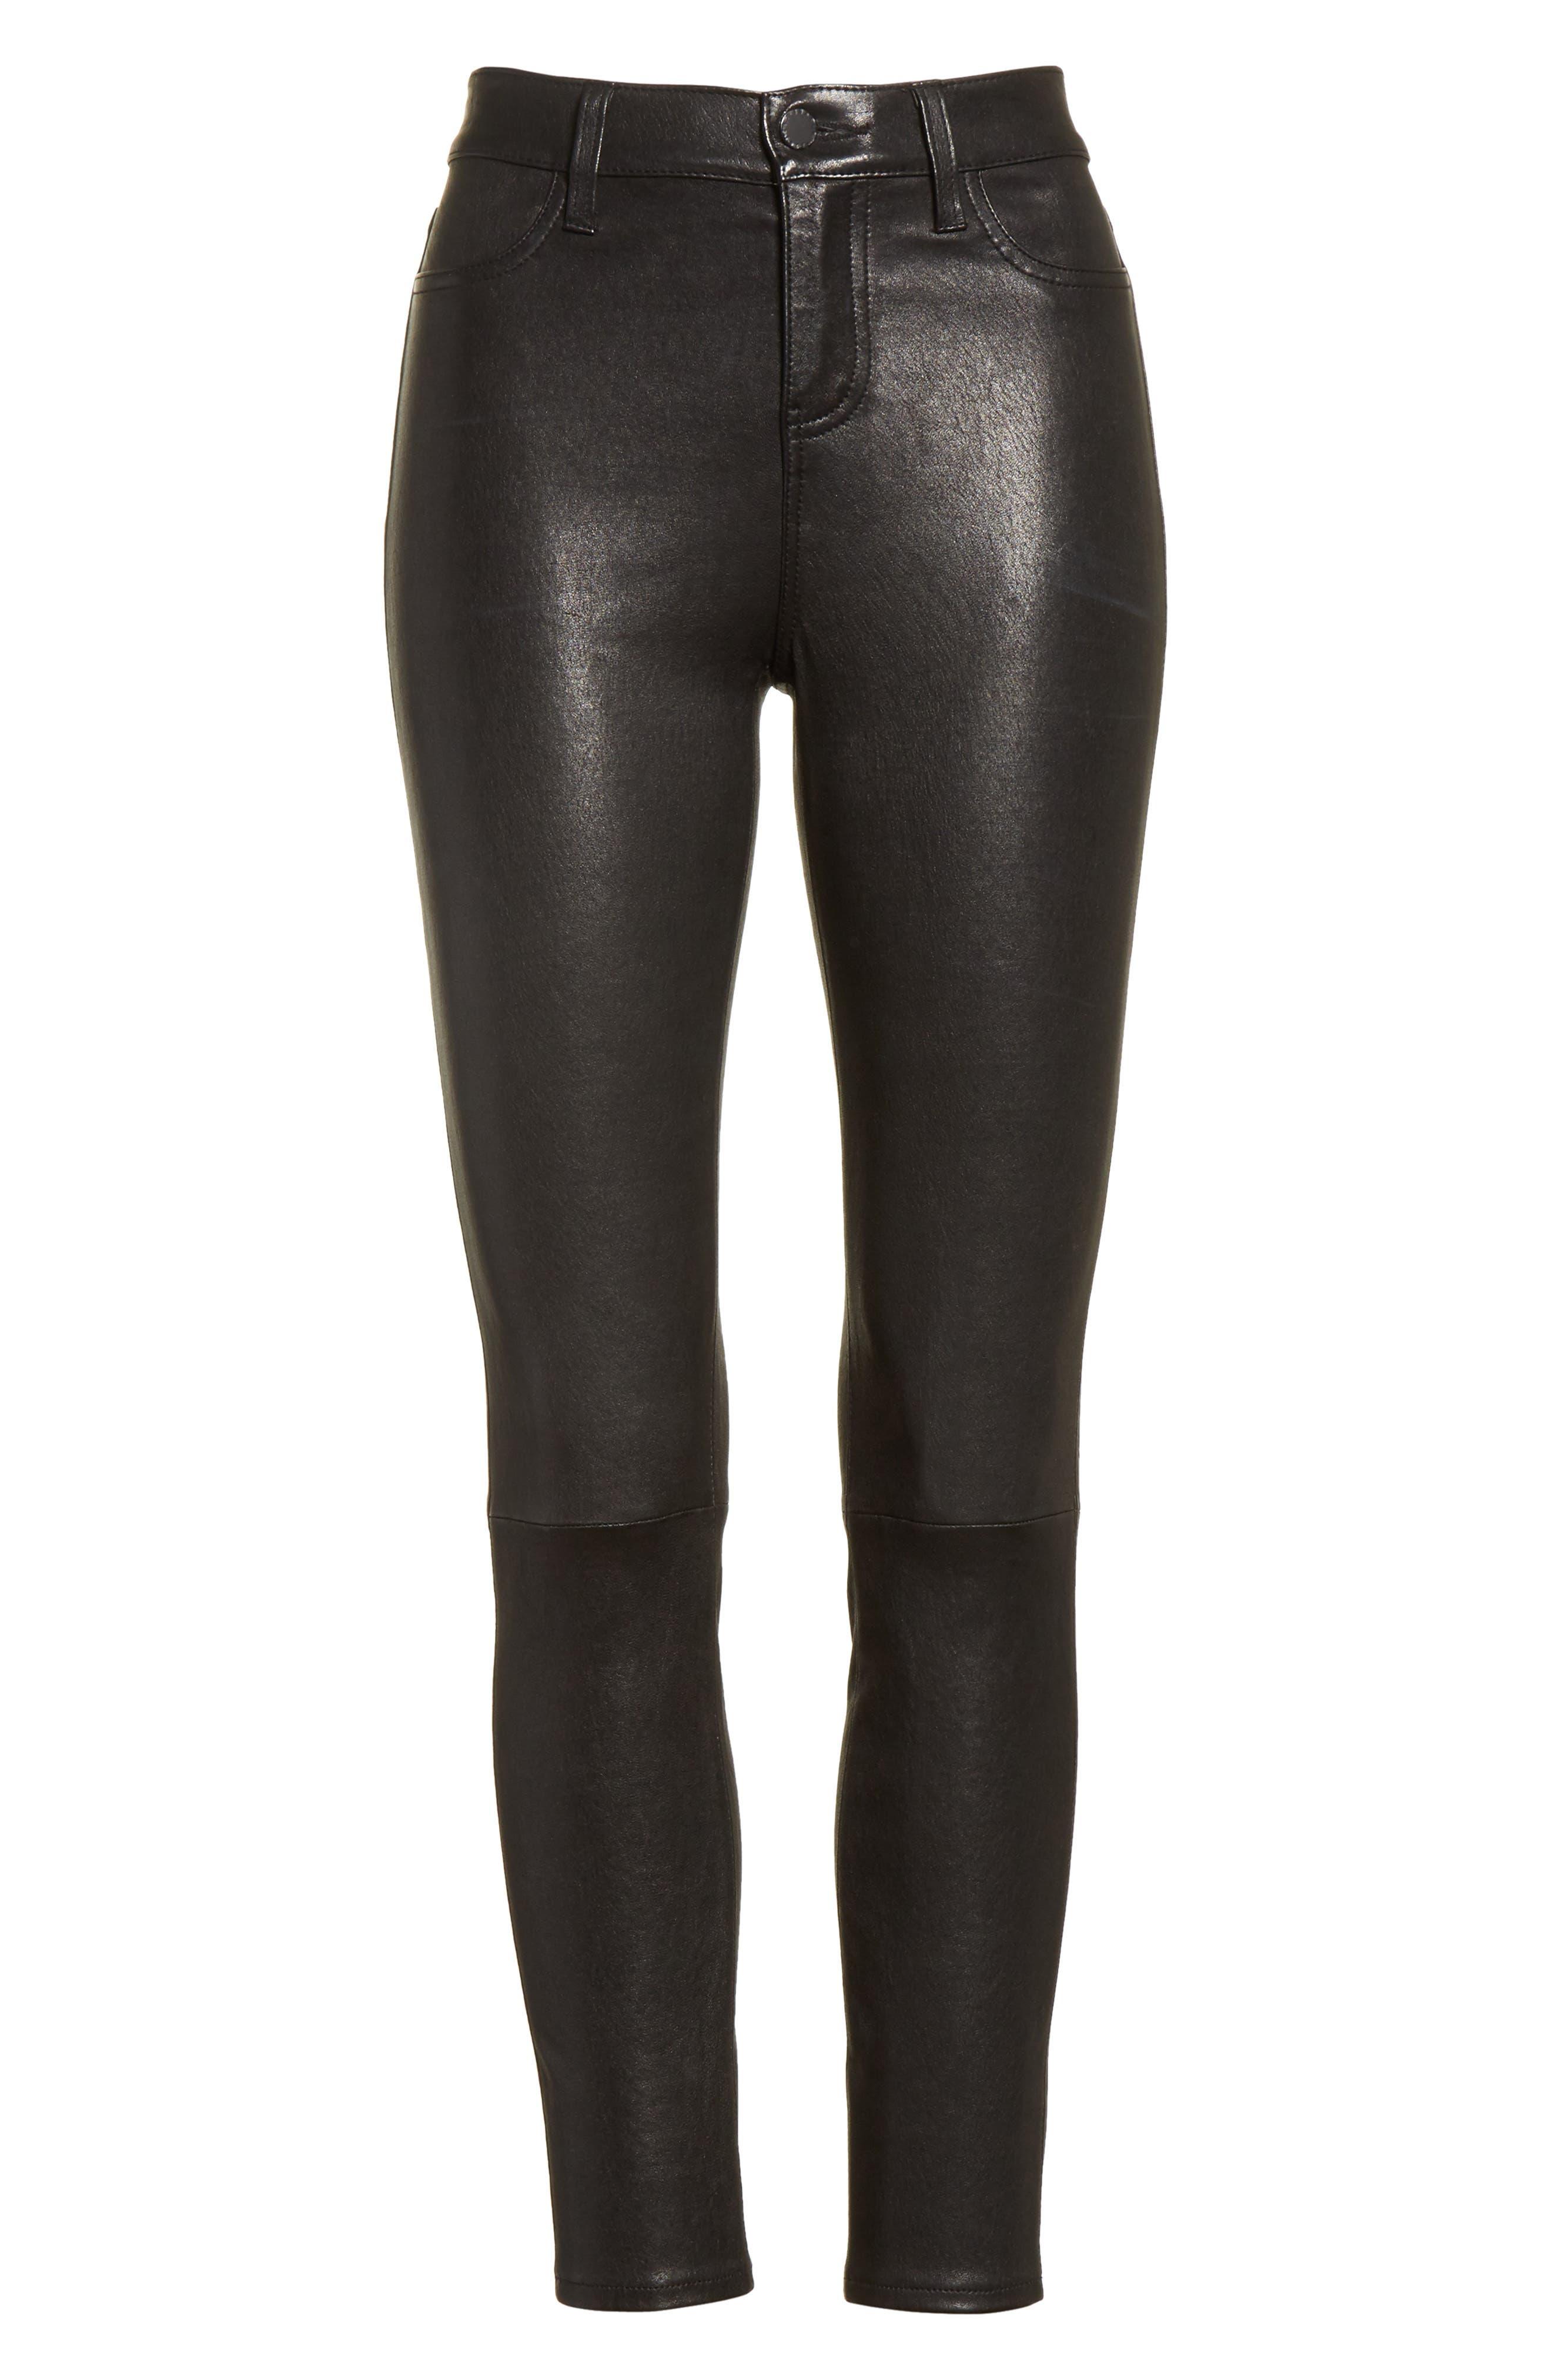 LAGENCE Adelaide High Waist Crop Leather Jeans,                             Alternate thumbnail 6, color,                             Noir